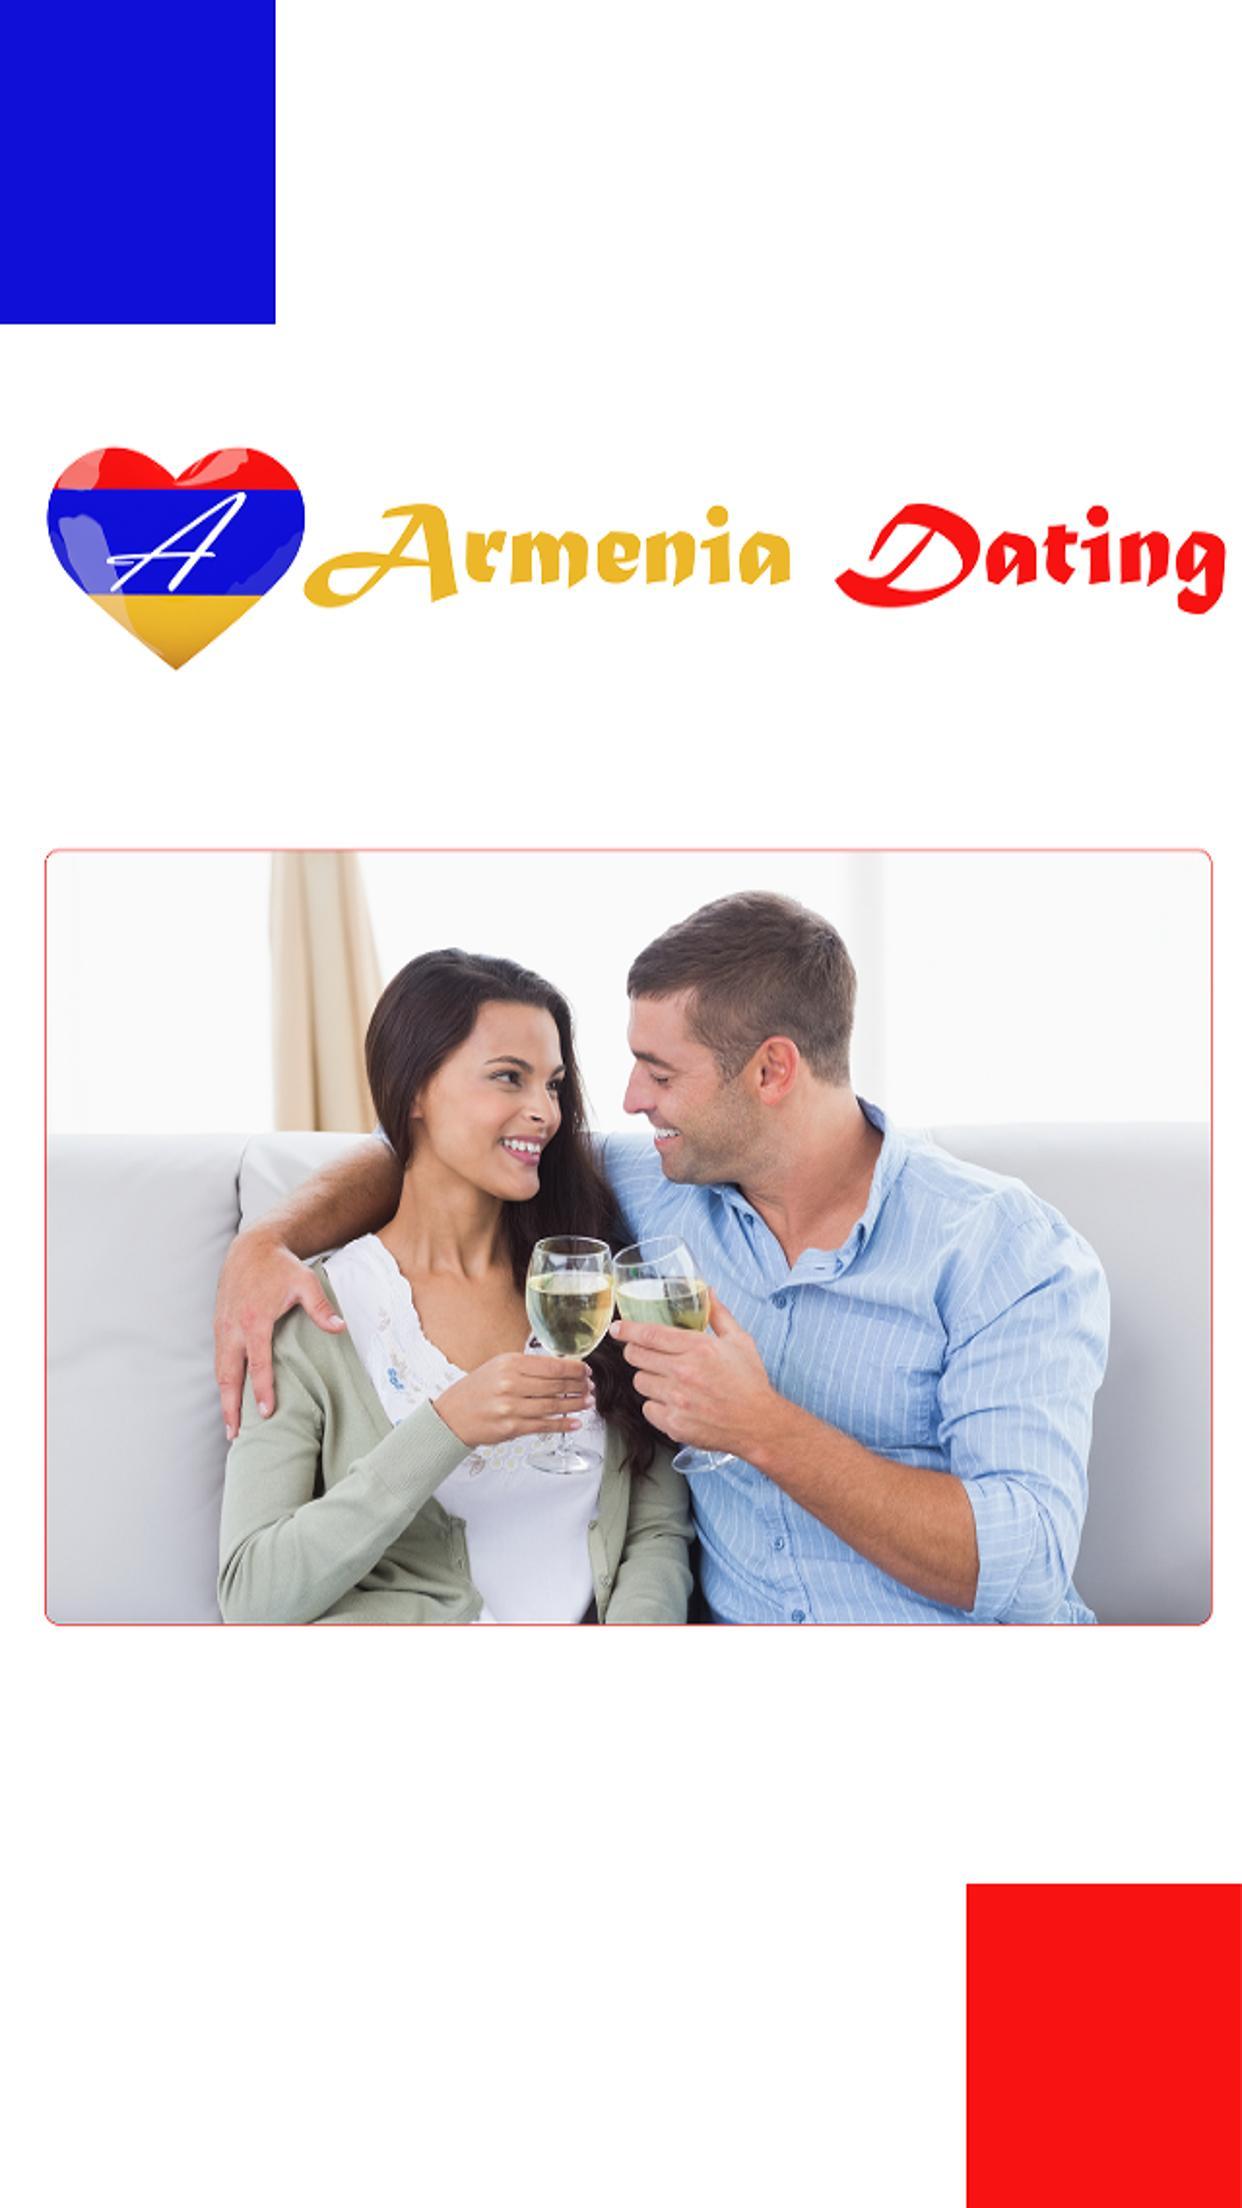 armenia dating online